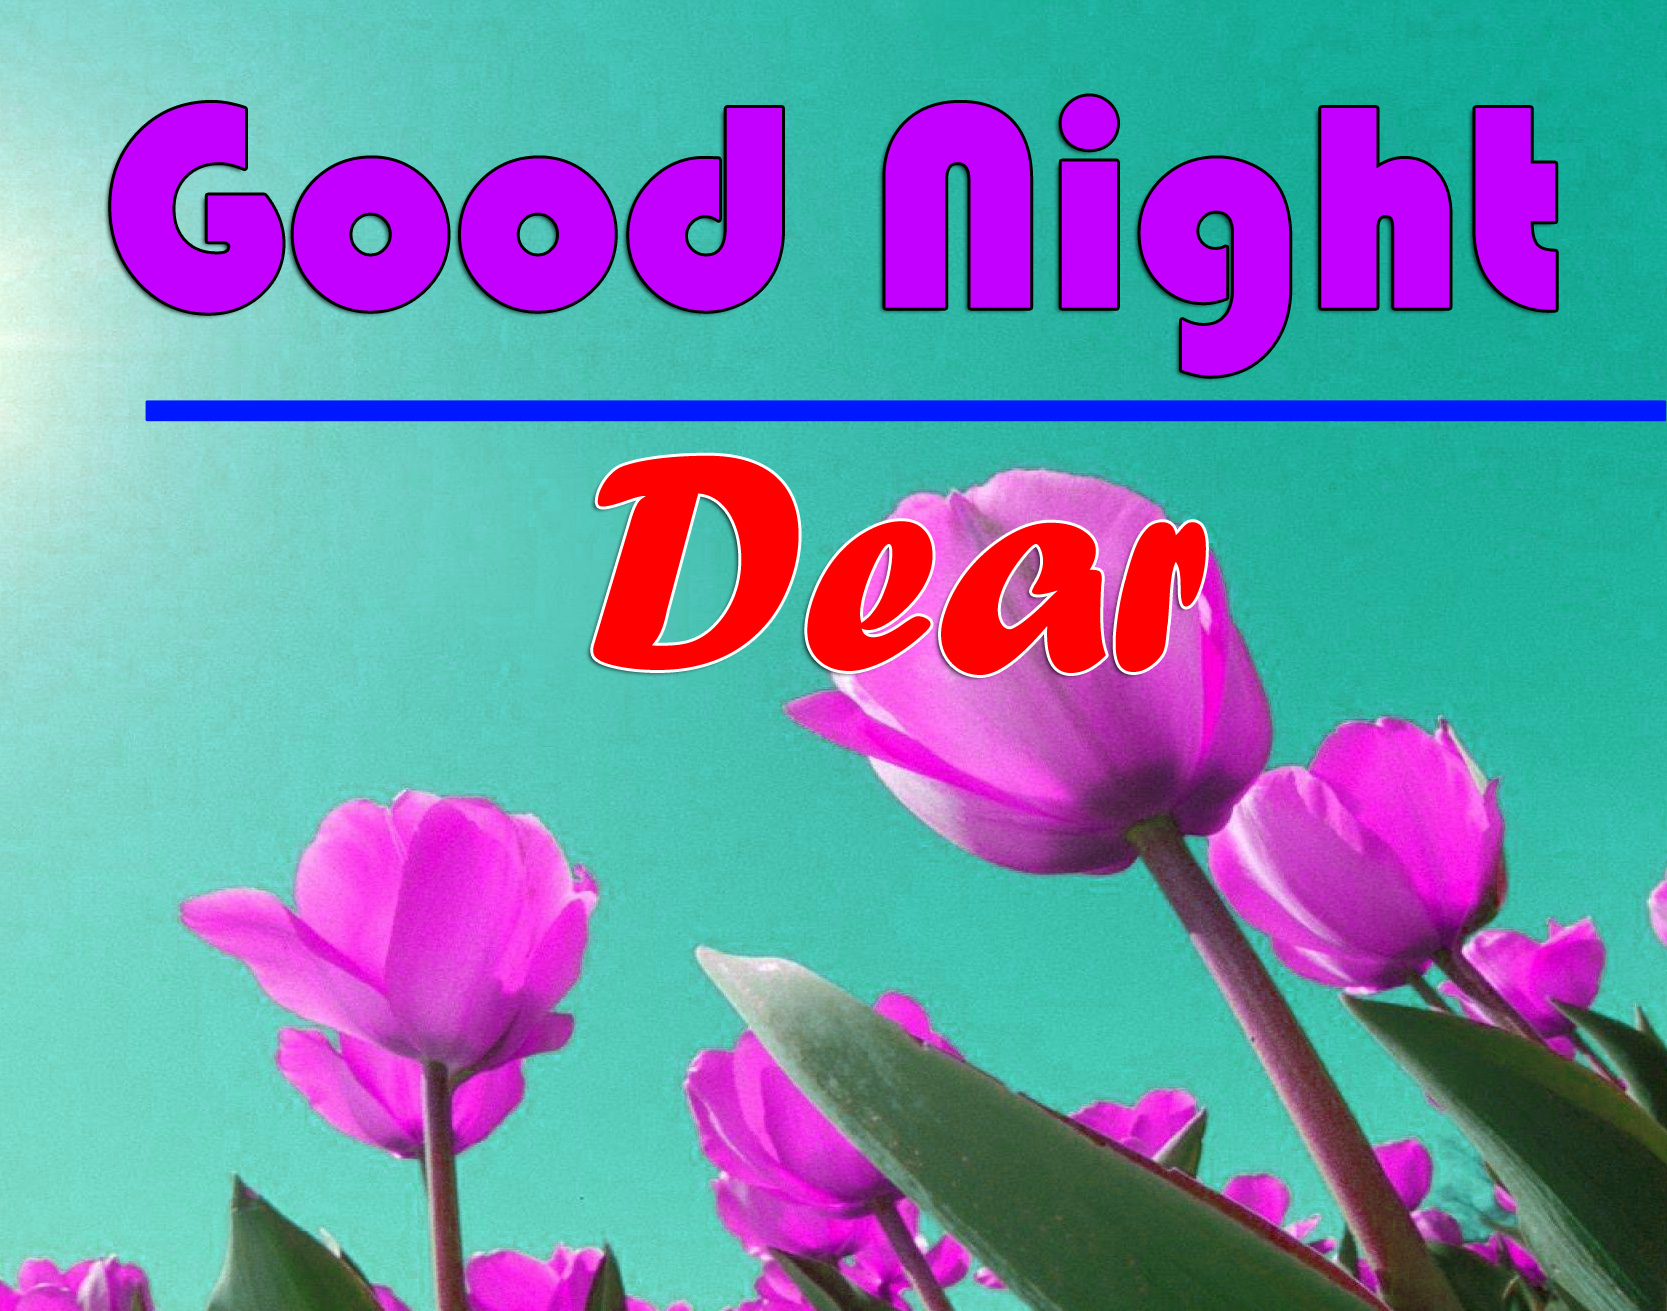 Good Night photo 6 1